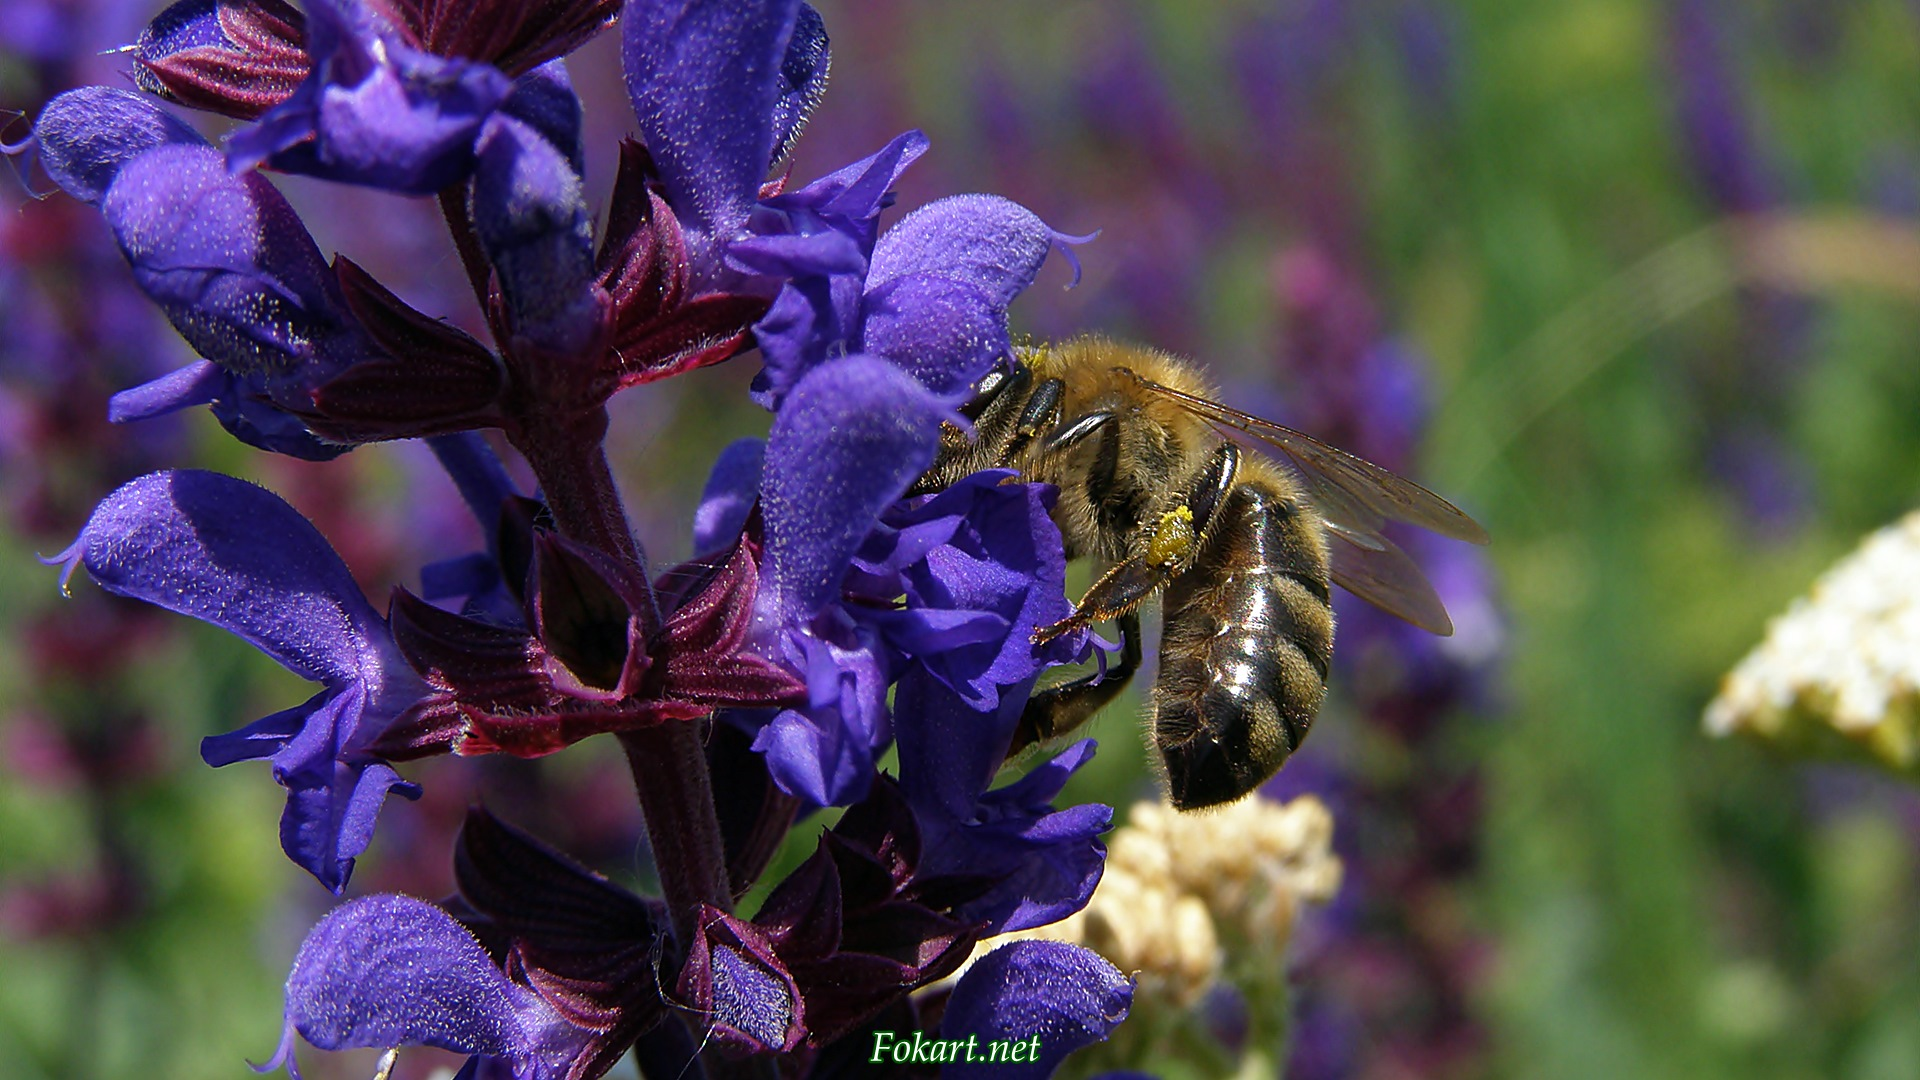 Пчела собирает нектар с цветка шалфея лугового